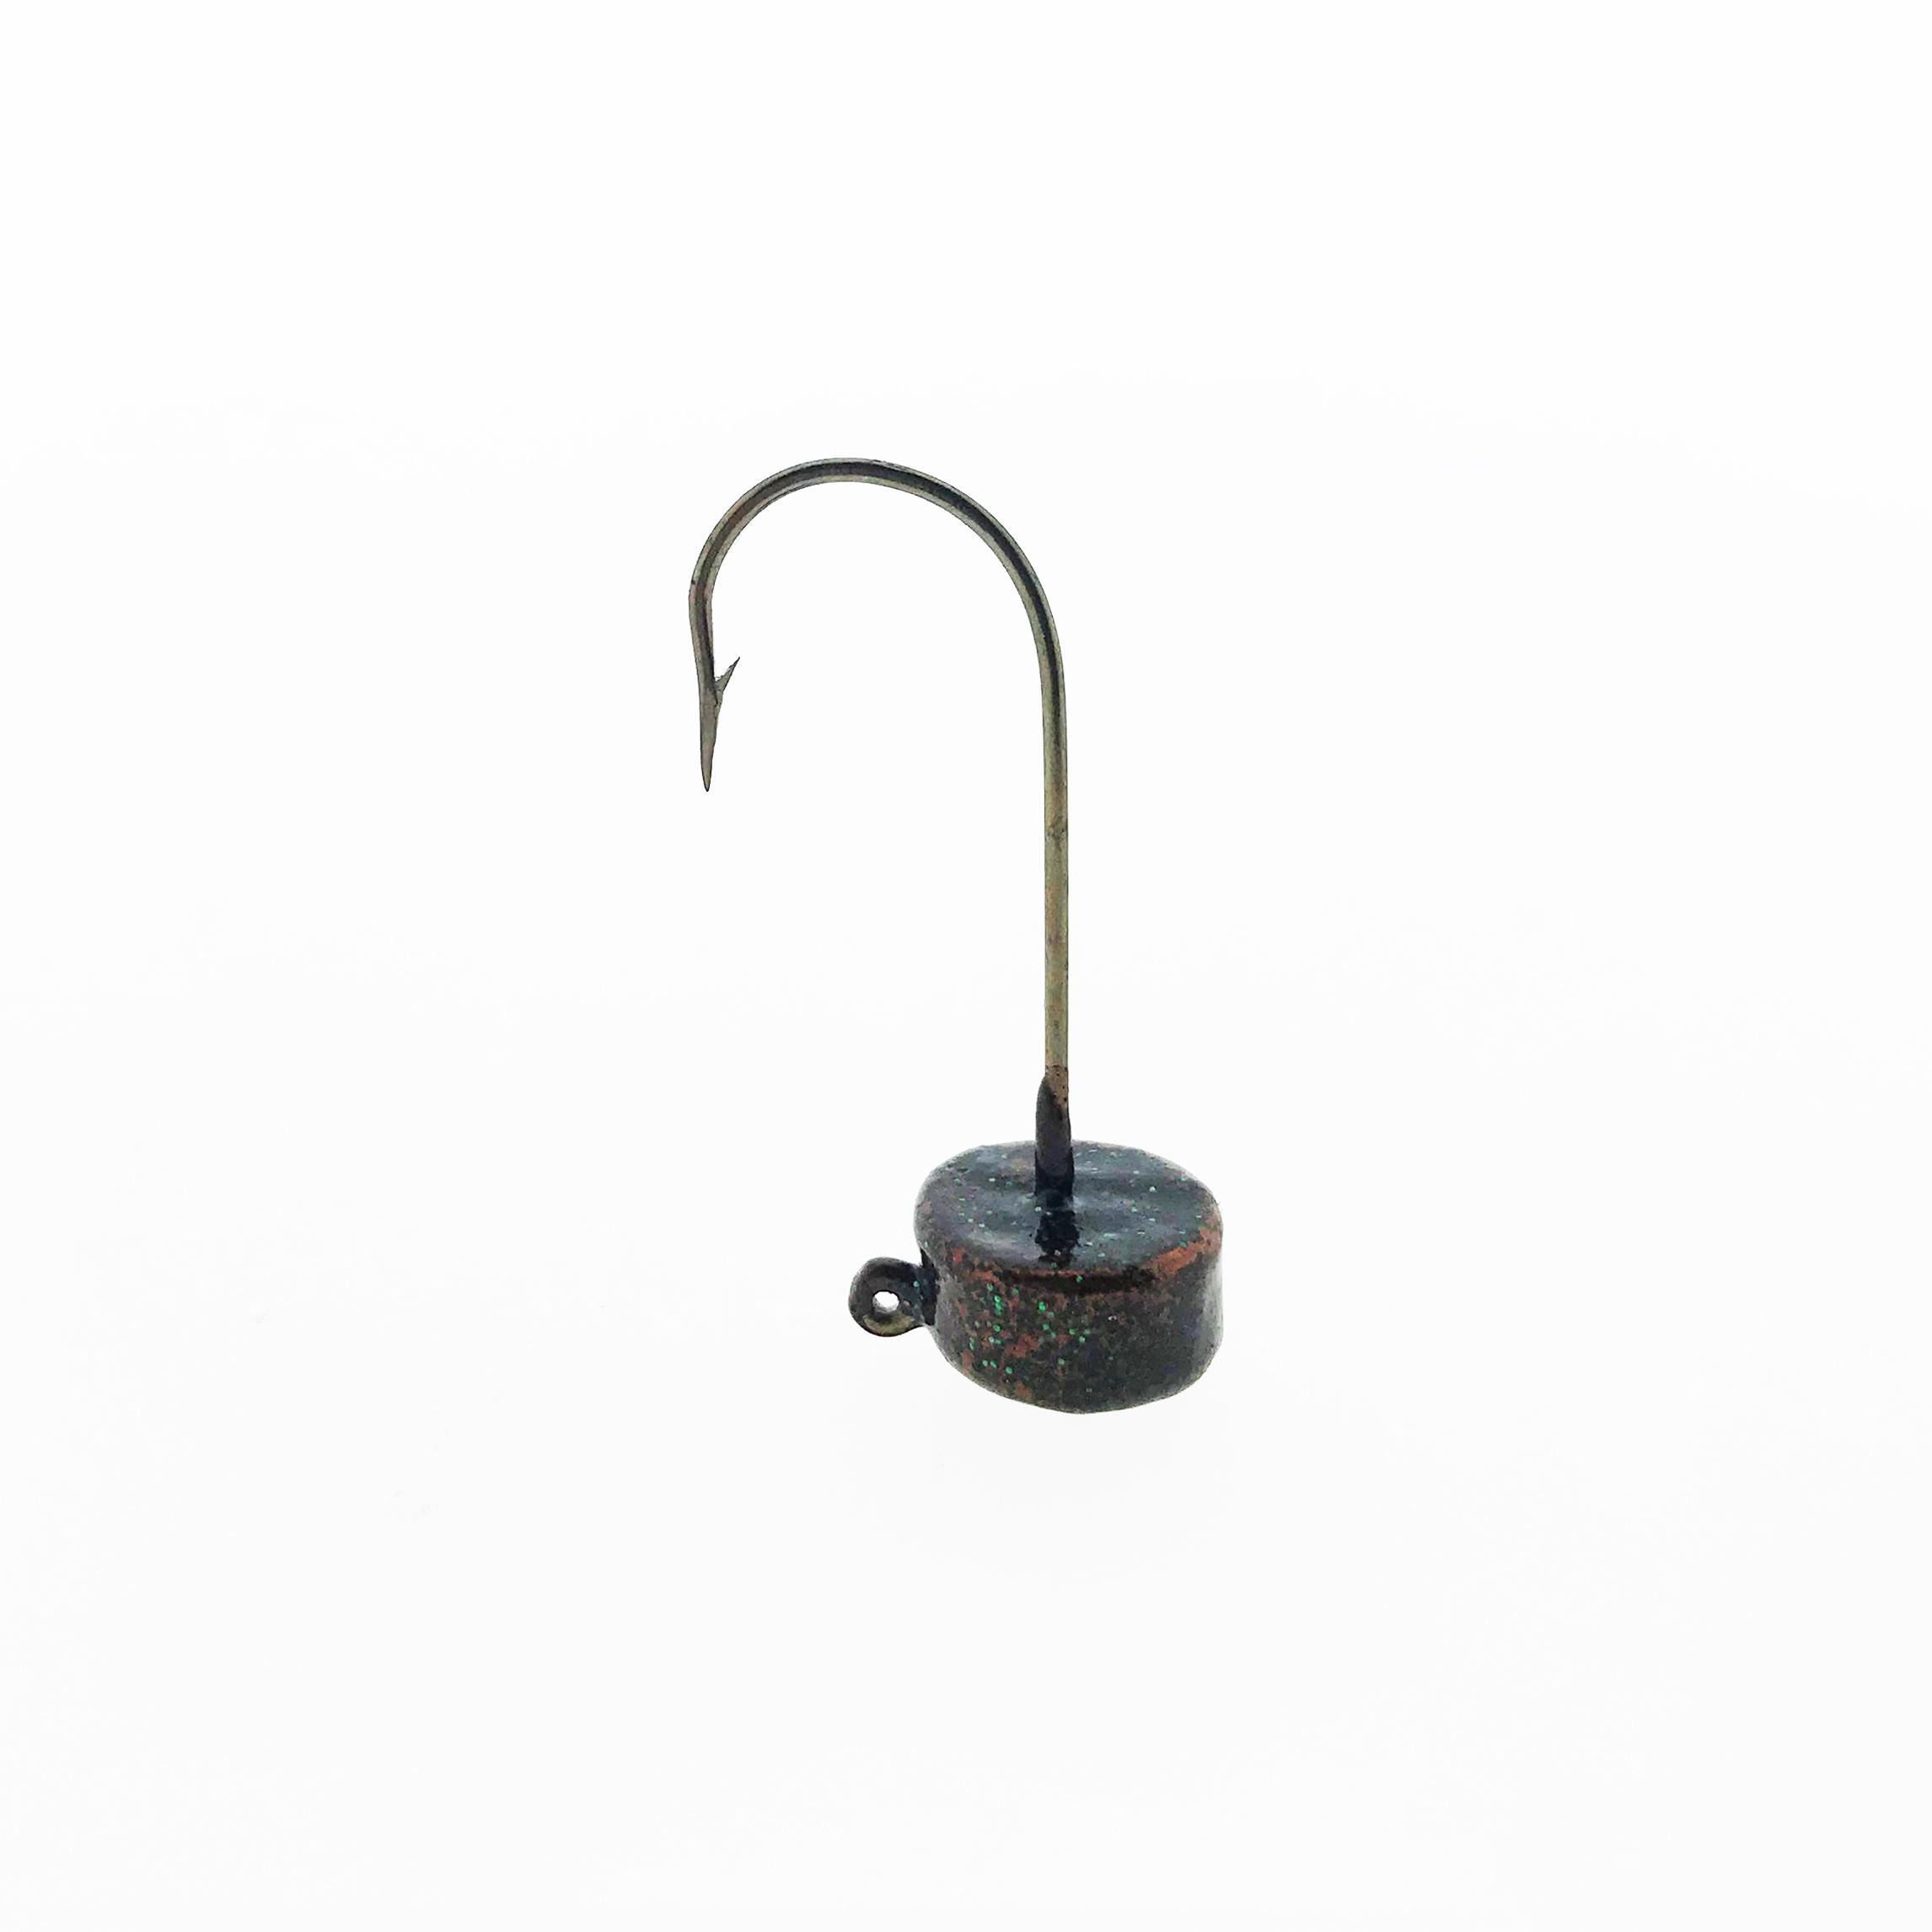 Ned Rig Standup Jighead 2/0 5gr Copper/Green